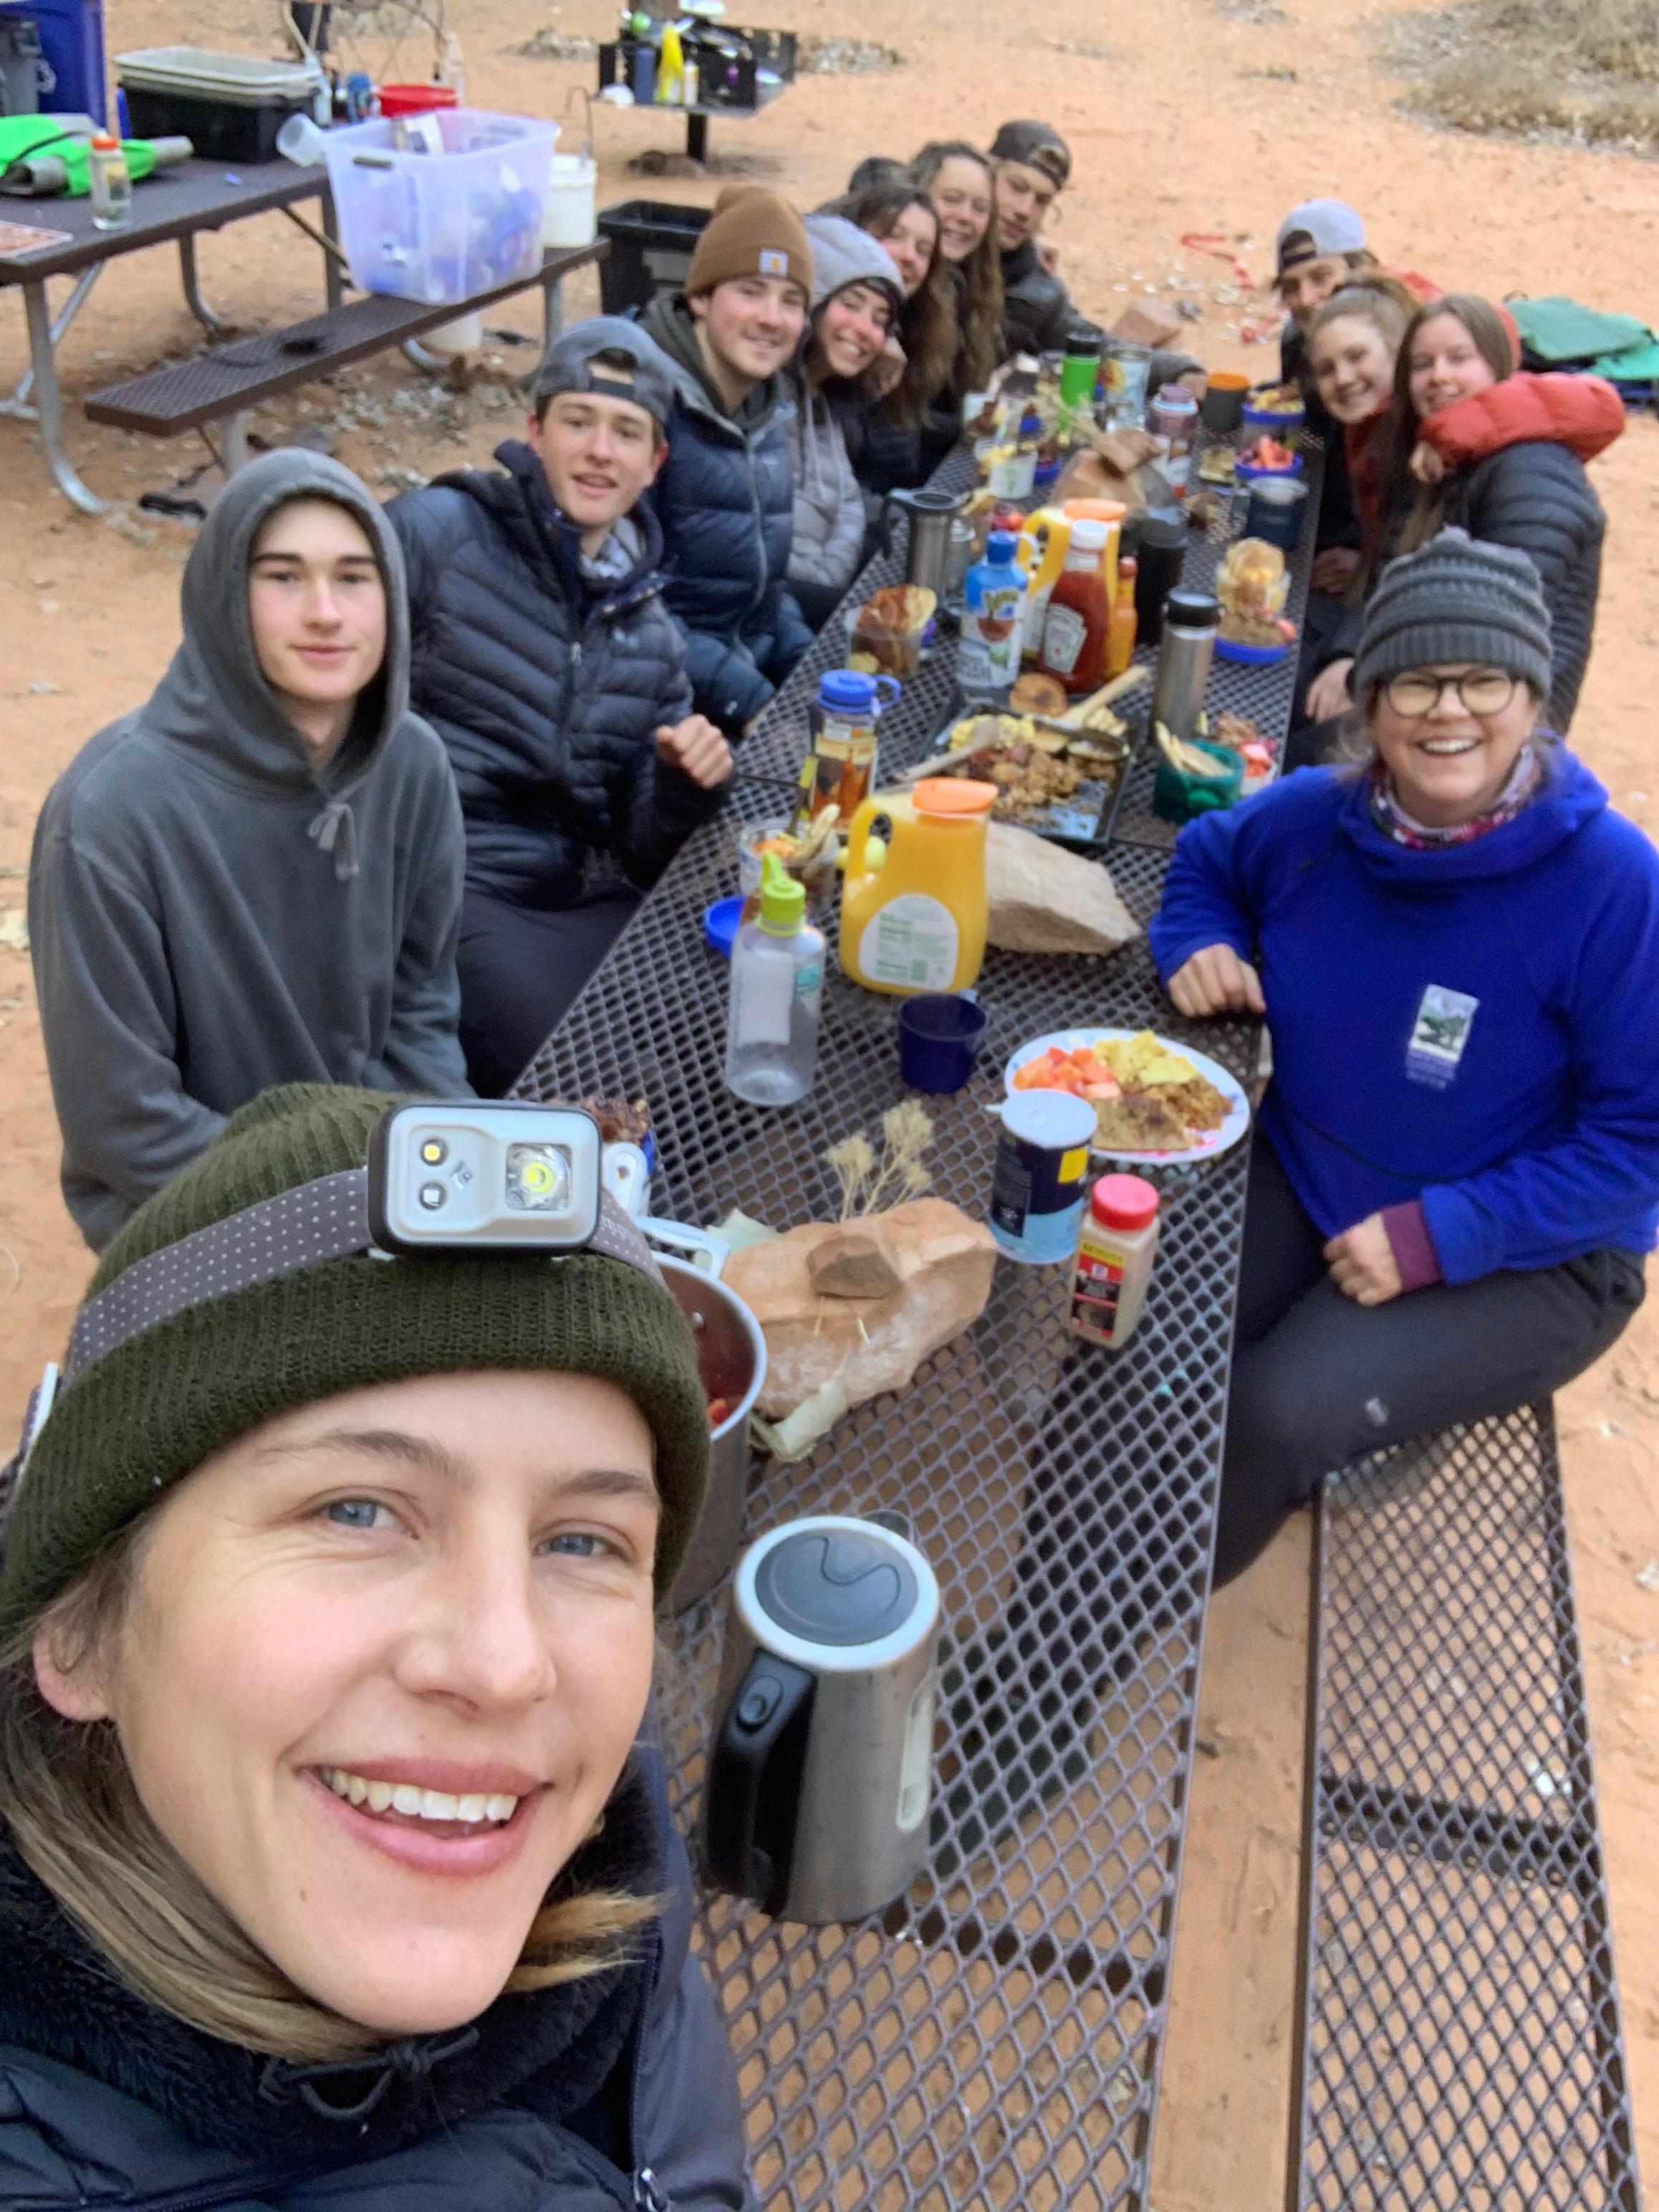 Proctor Academy Mountain Classroom Boarding School Outdoor Education